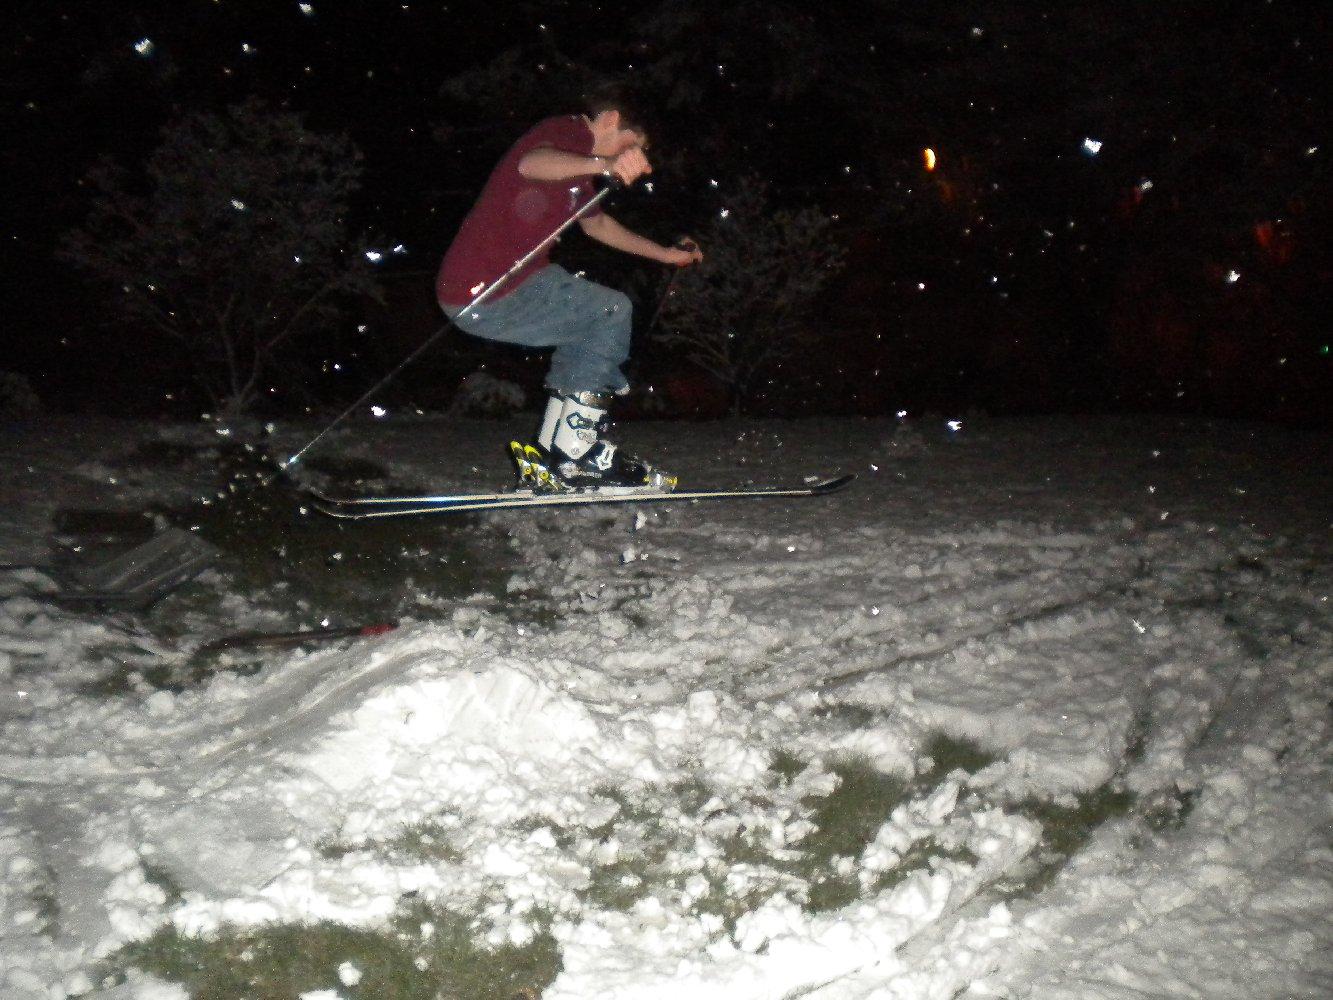 Backyard Skiing on April 18th - 16 of 27